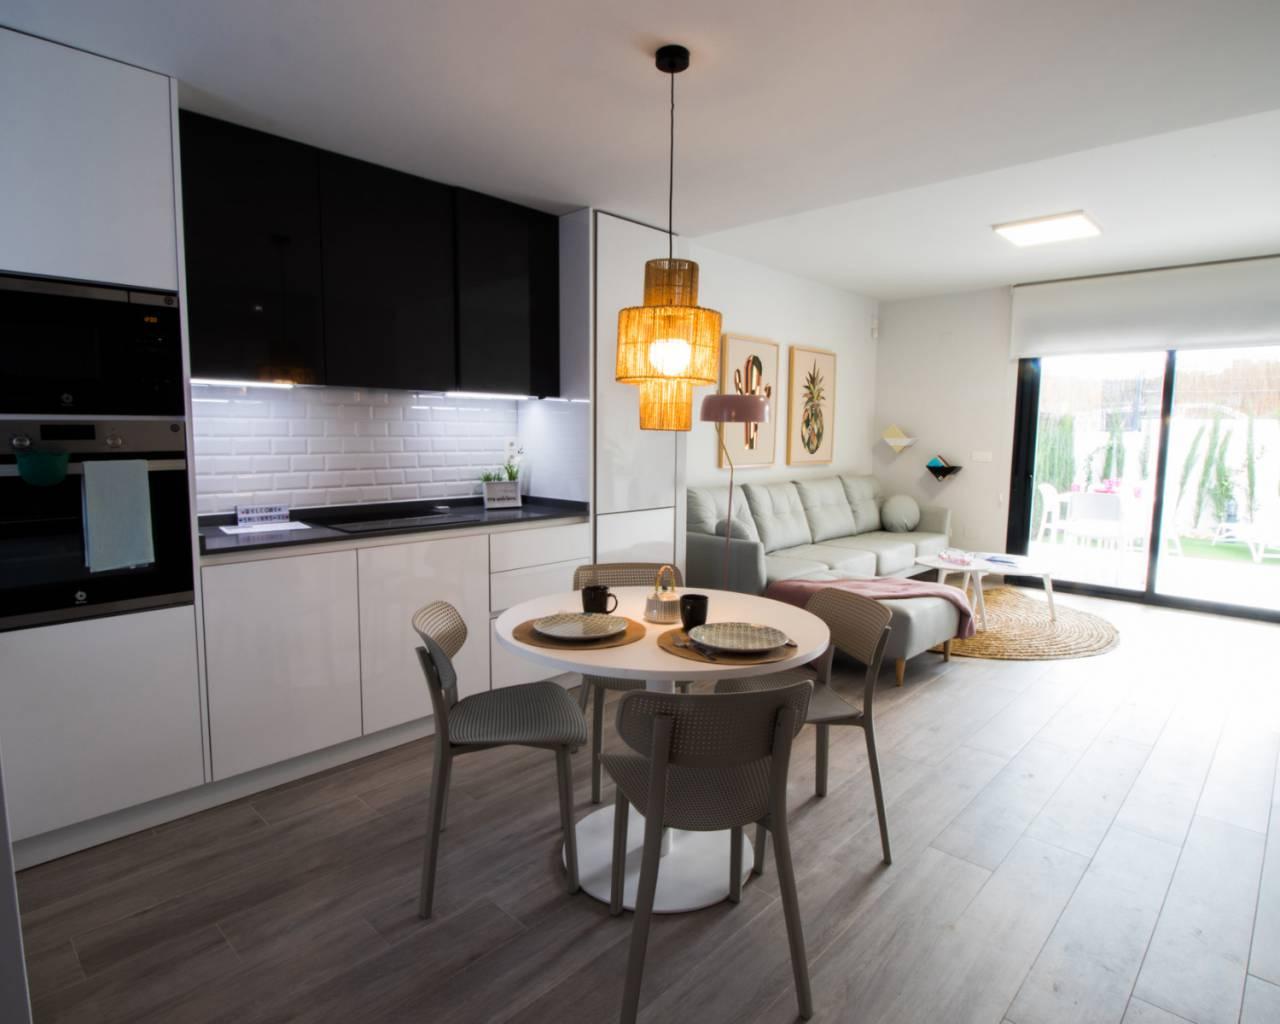 nieuwbouw-appartement-san-miguel-de-salinas_1789_xl